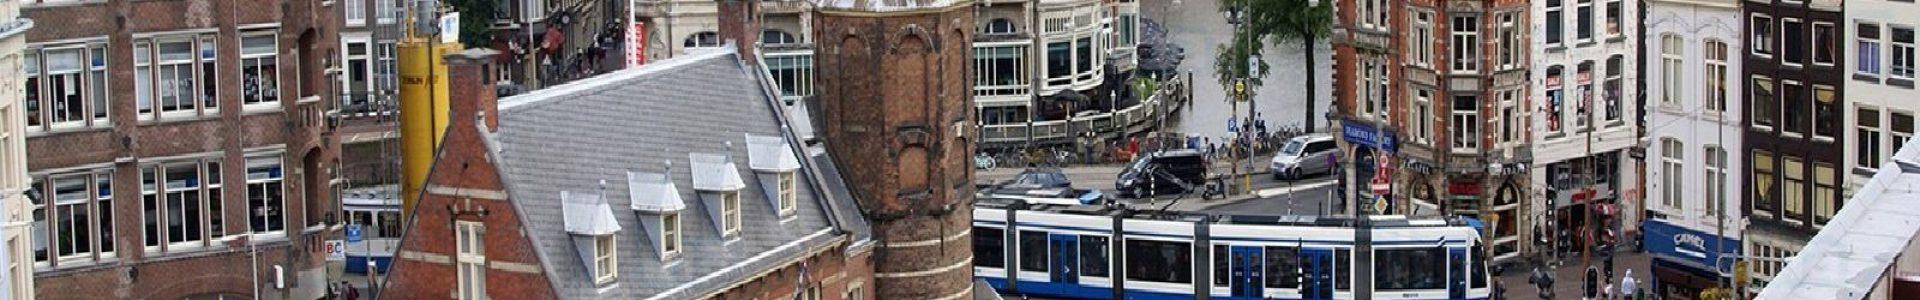 Amsterdam-bronneberg-beveiliging-security4